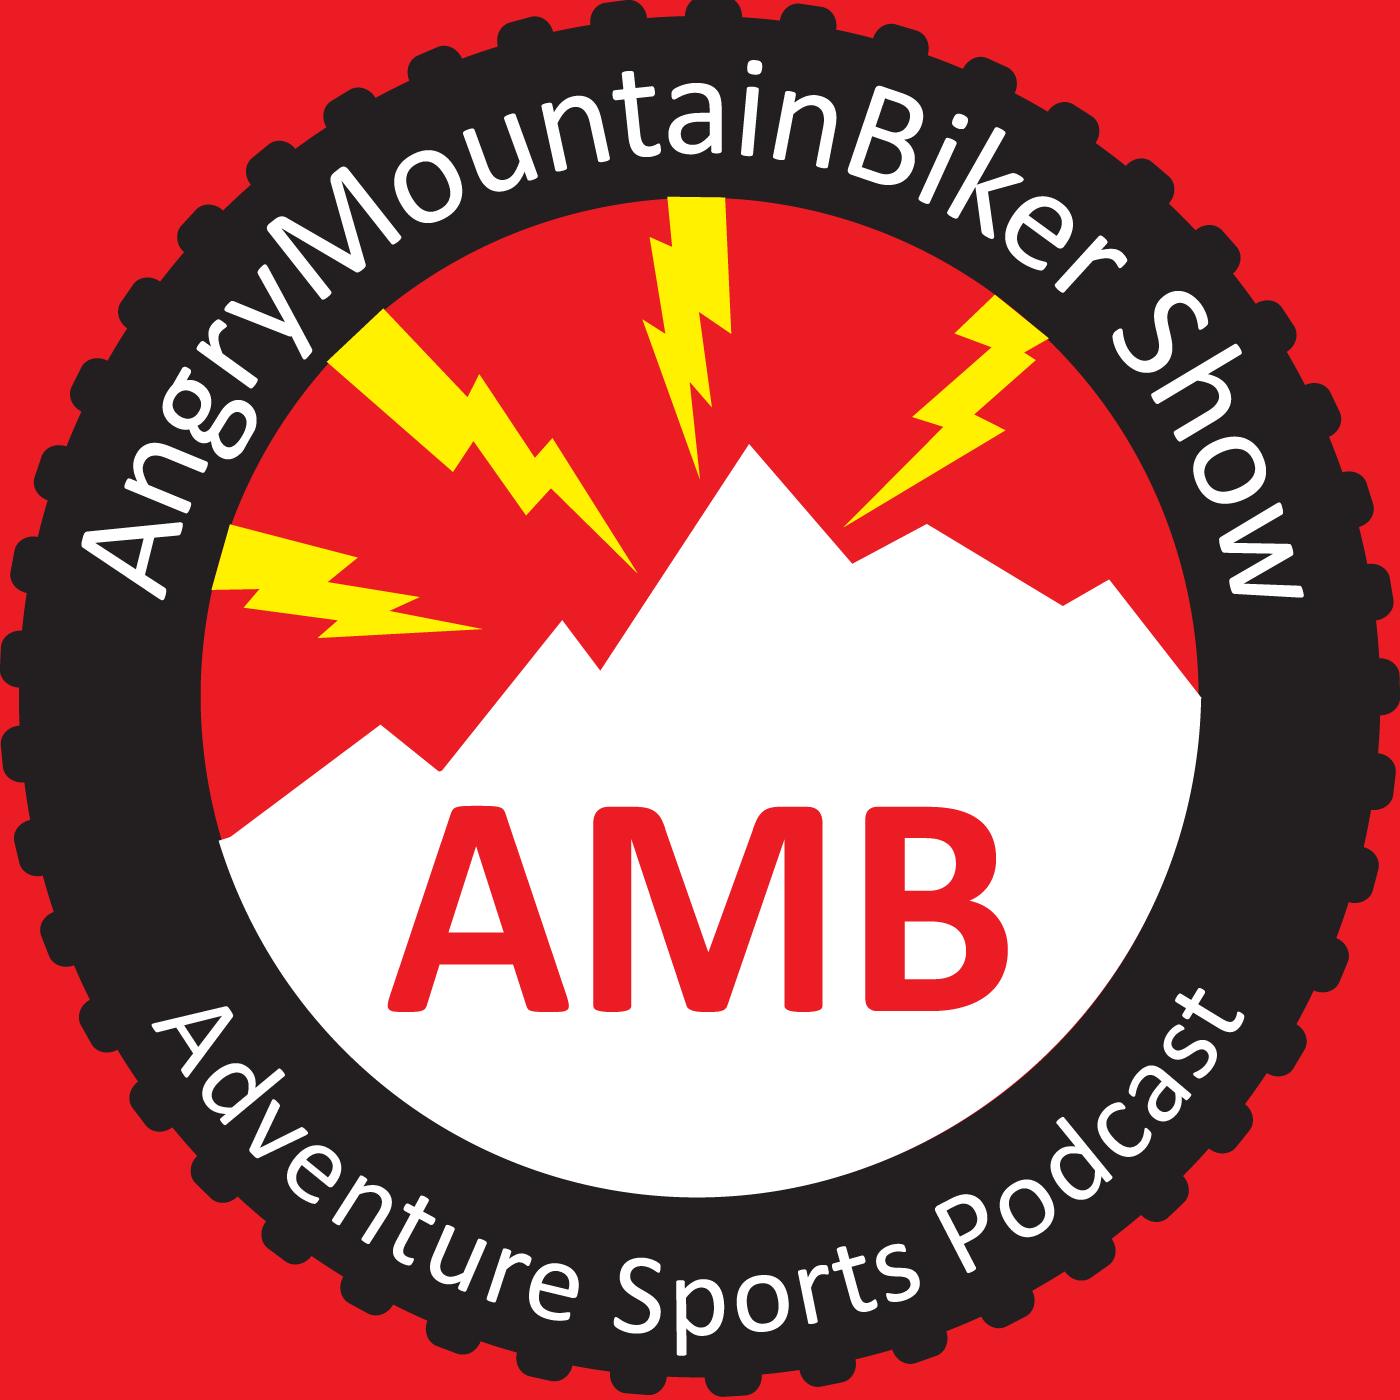 AngryMountainBiker Show logo